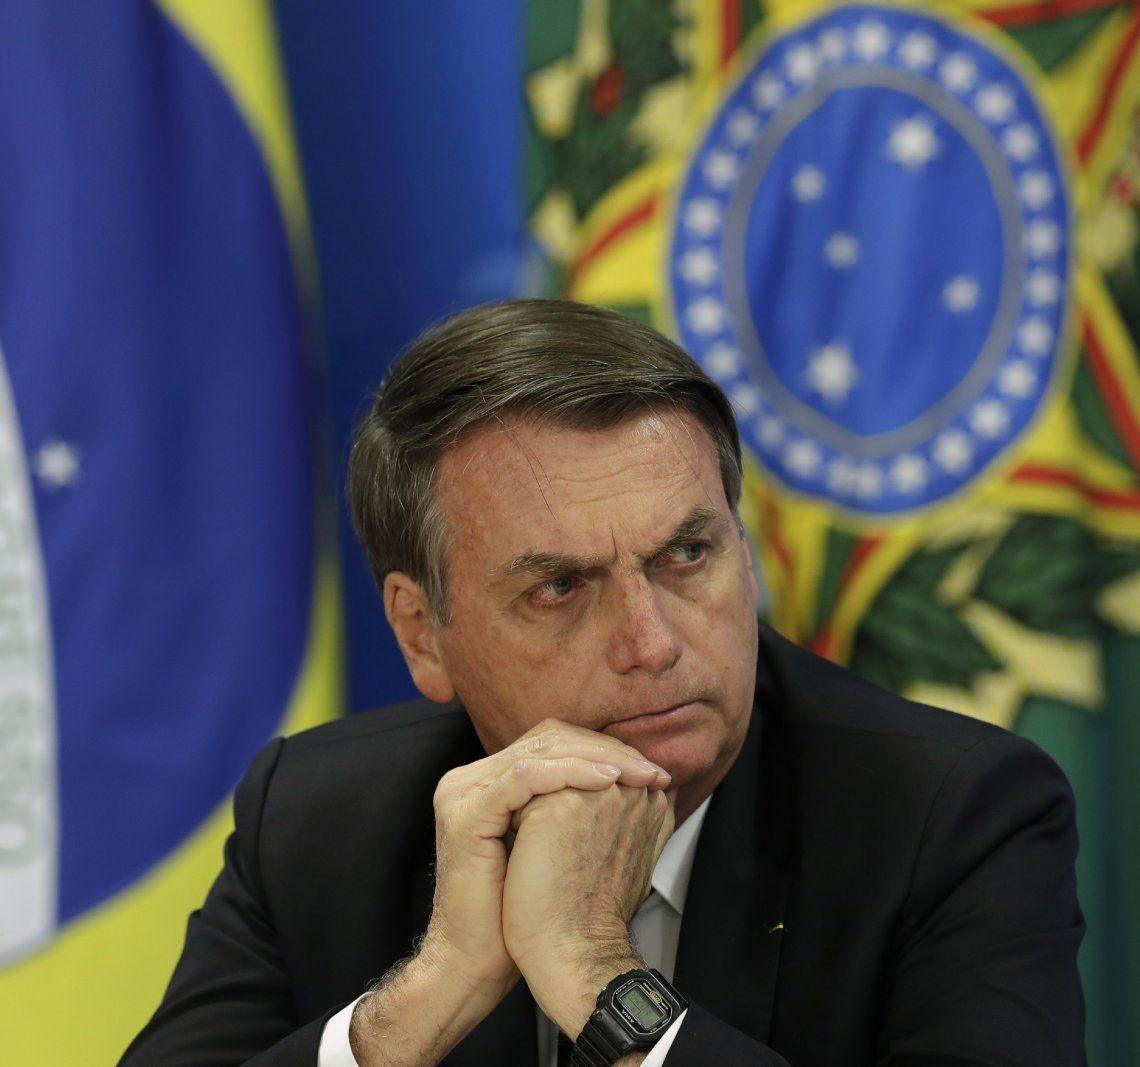 El presidente Bolsonaro